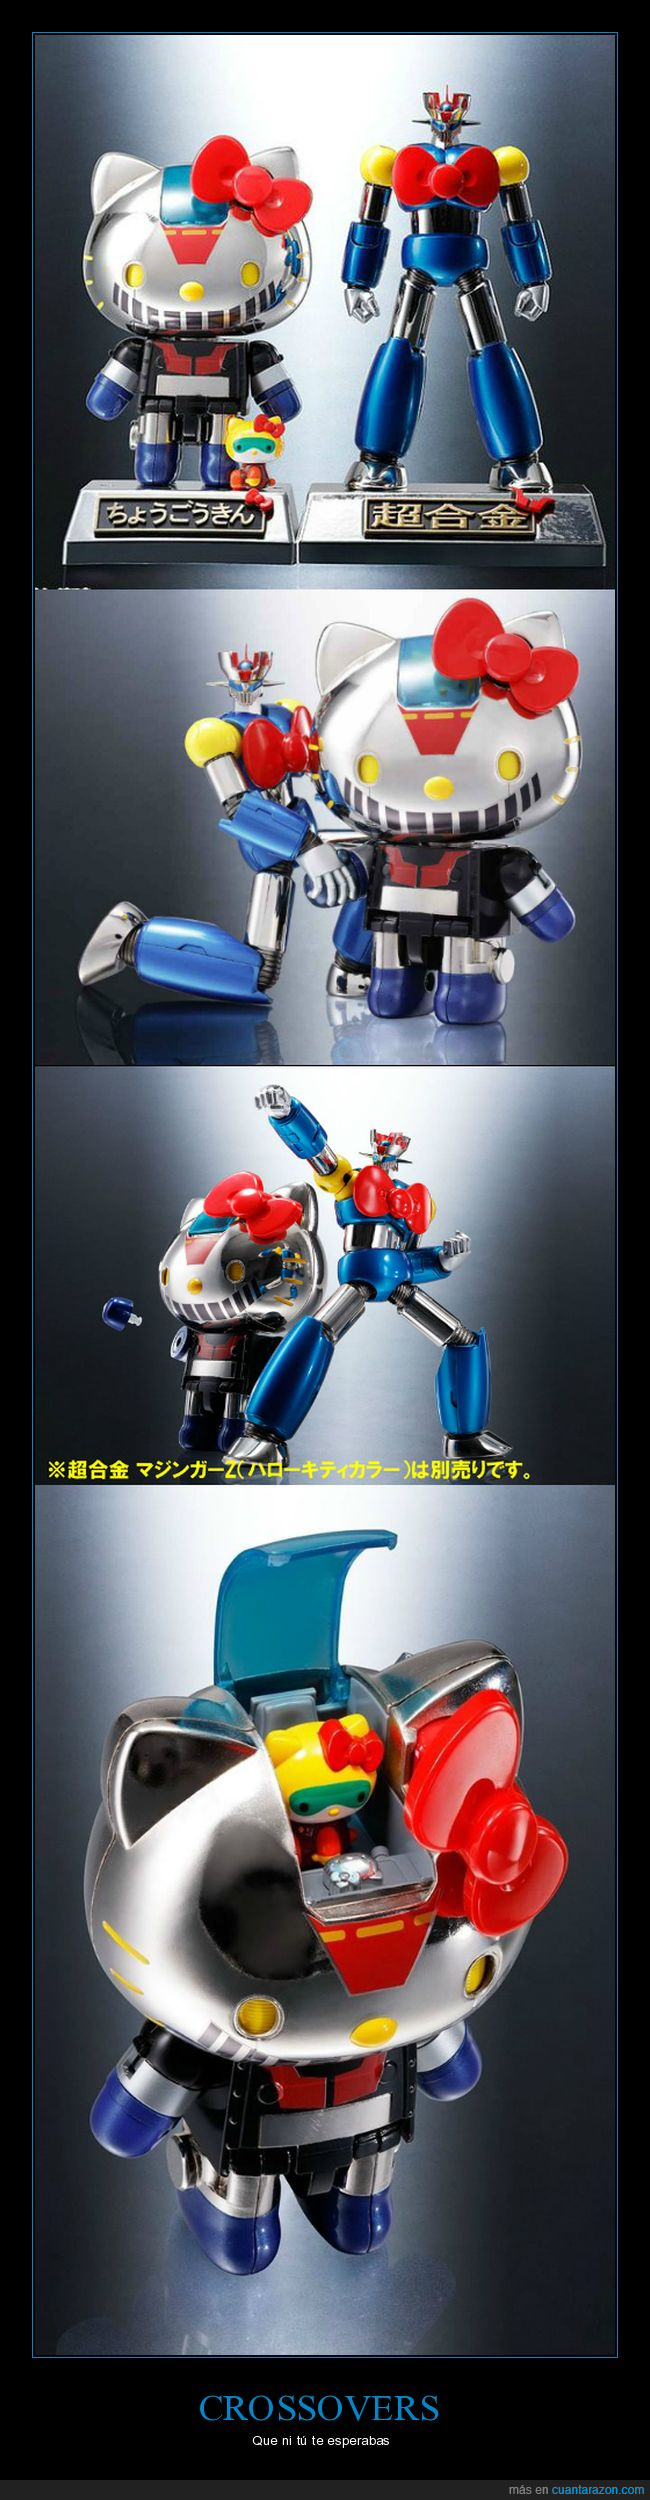 crossover,crossovers,figura,hello kitty,juguete,koki kabuto,mazinger,mazinger z,robot,soul of chogokin